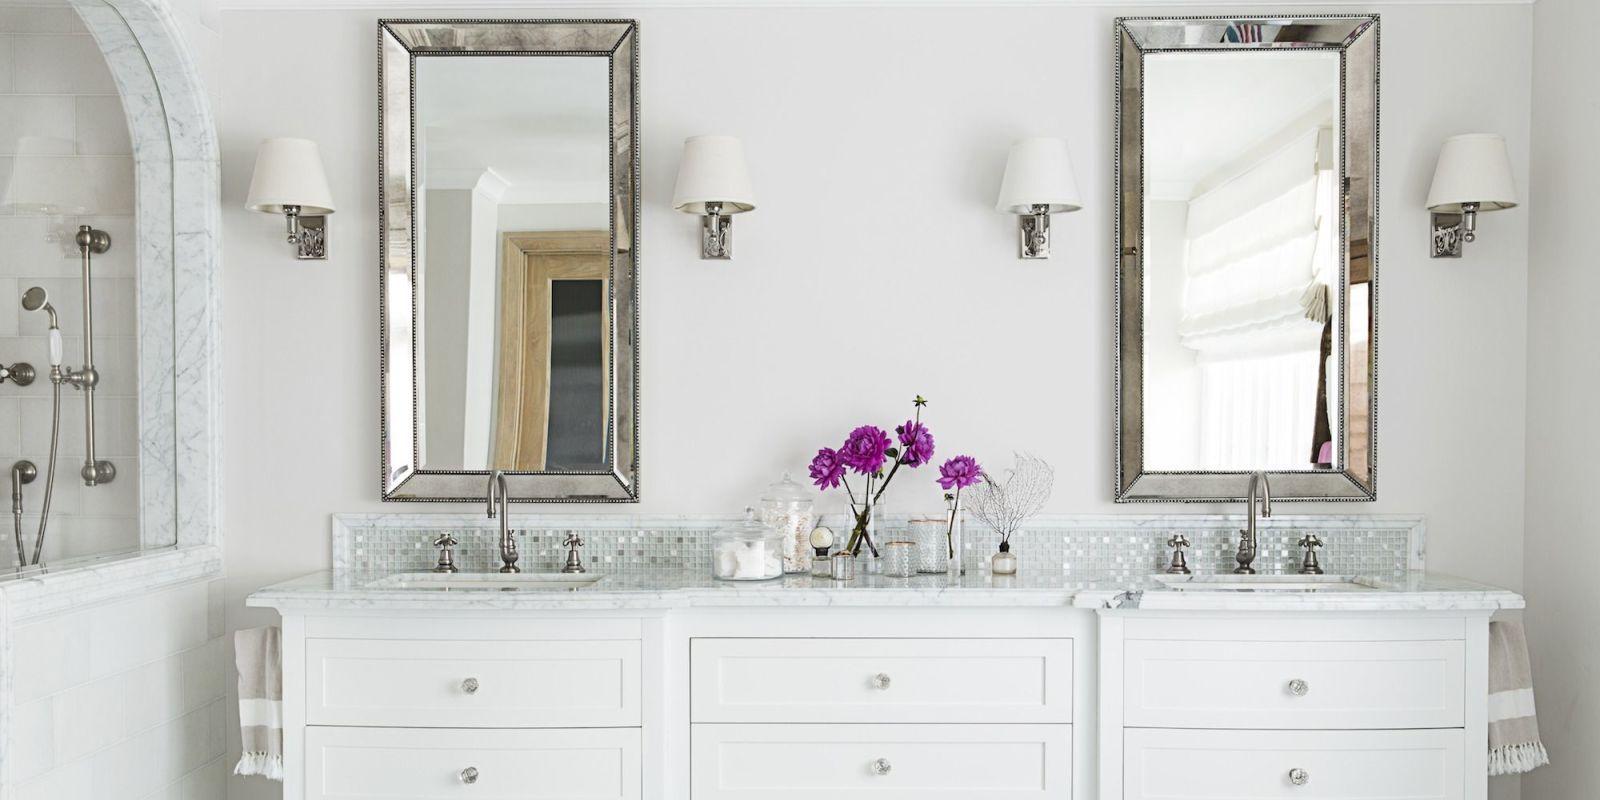 Lisa Romerein & 23 Bathroom Decorating Ideas - Pictures of Bathroom Decor and Designs